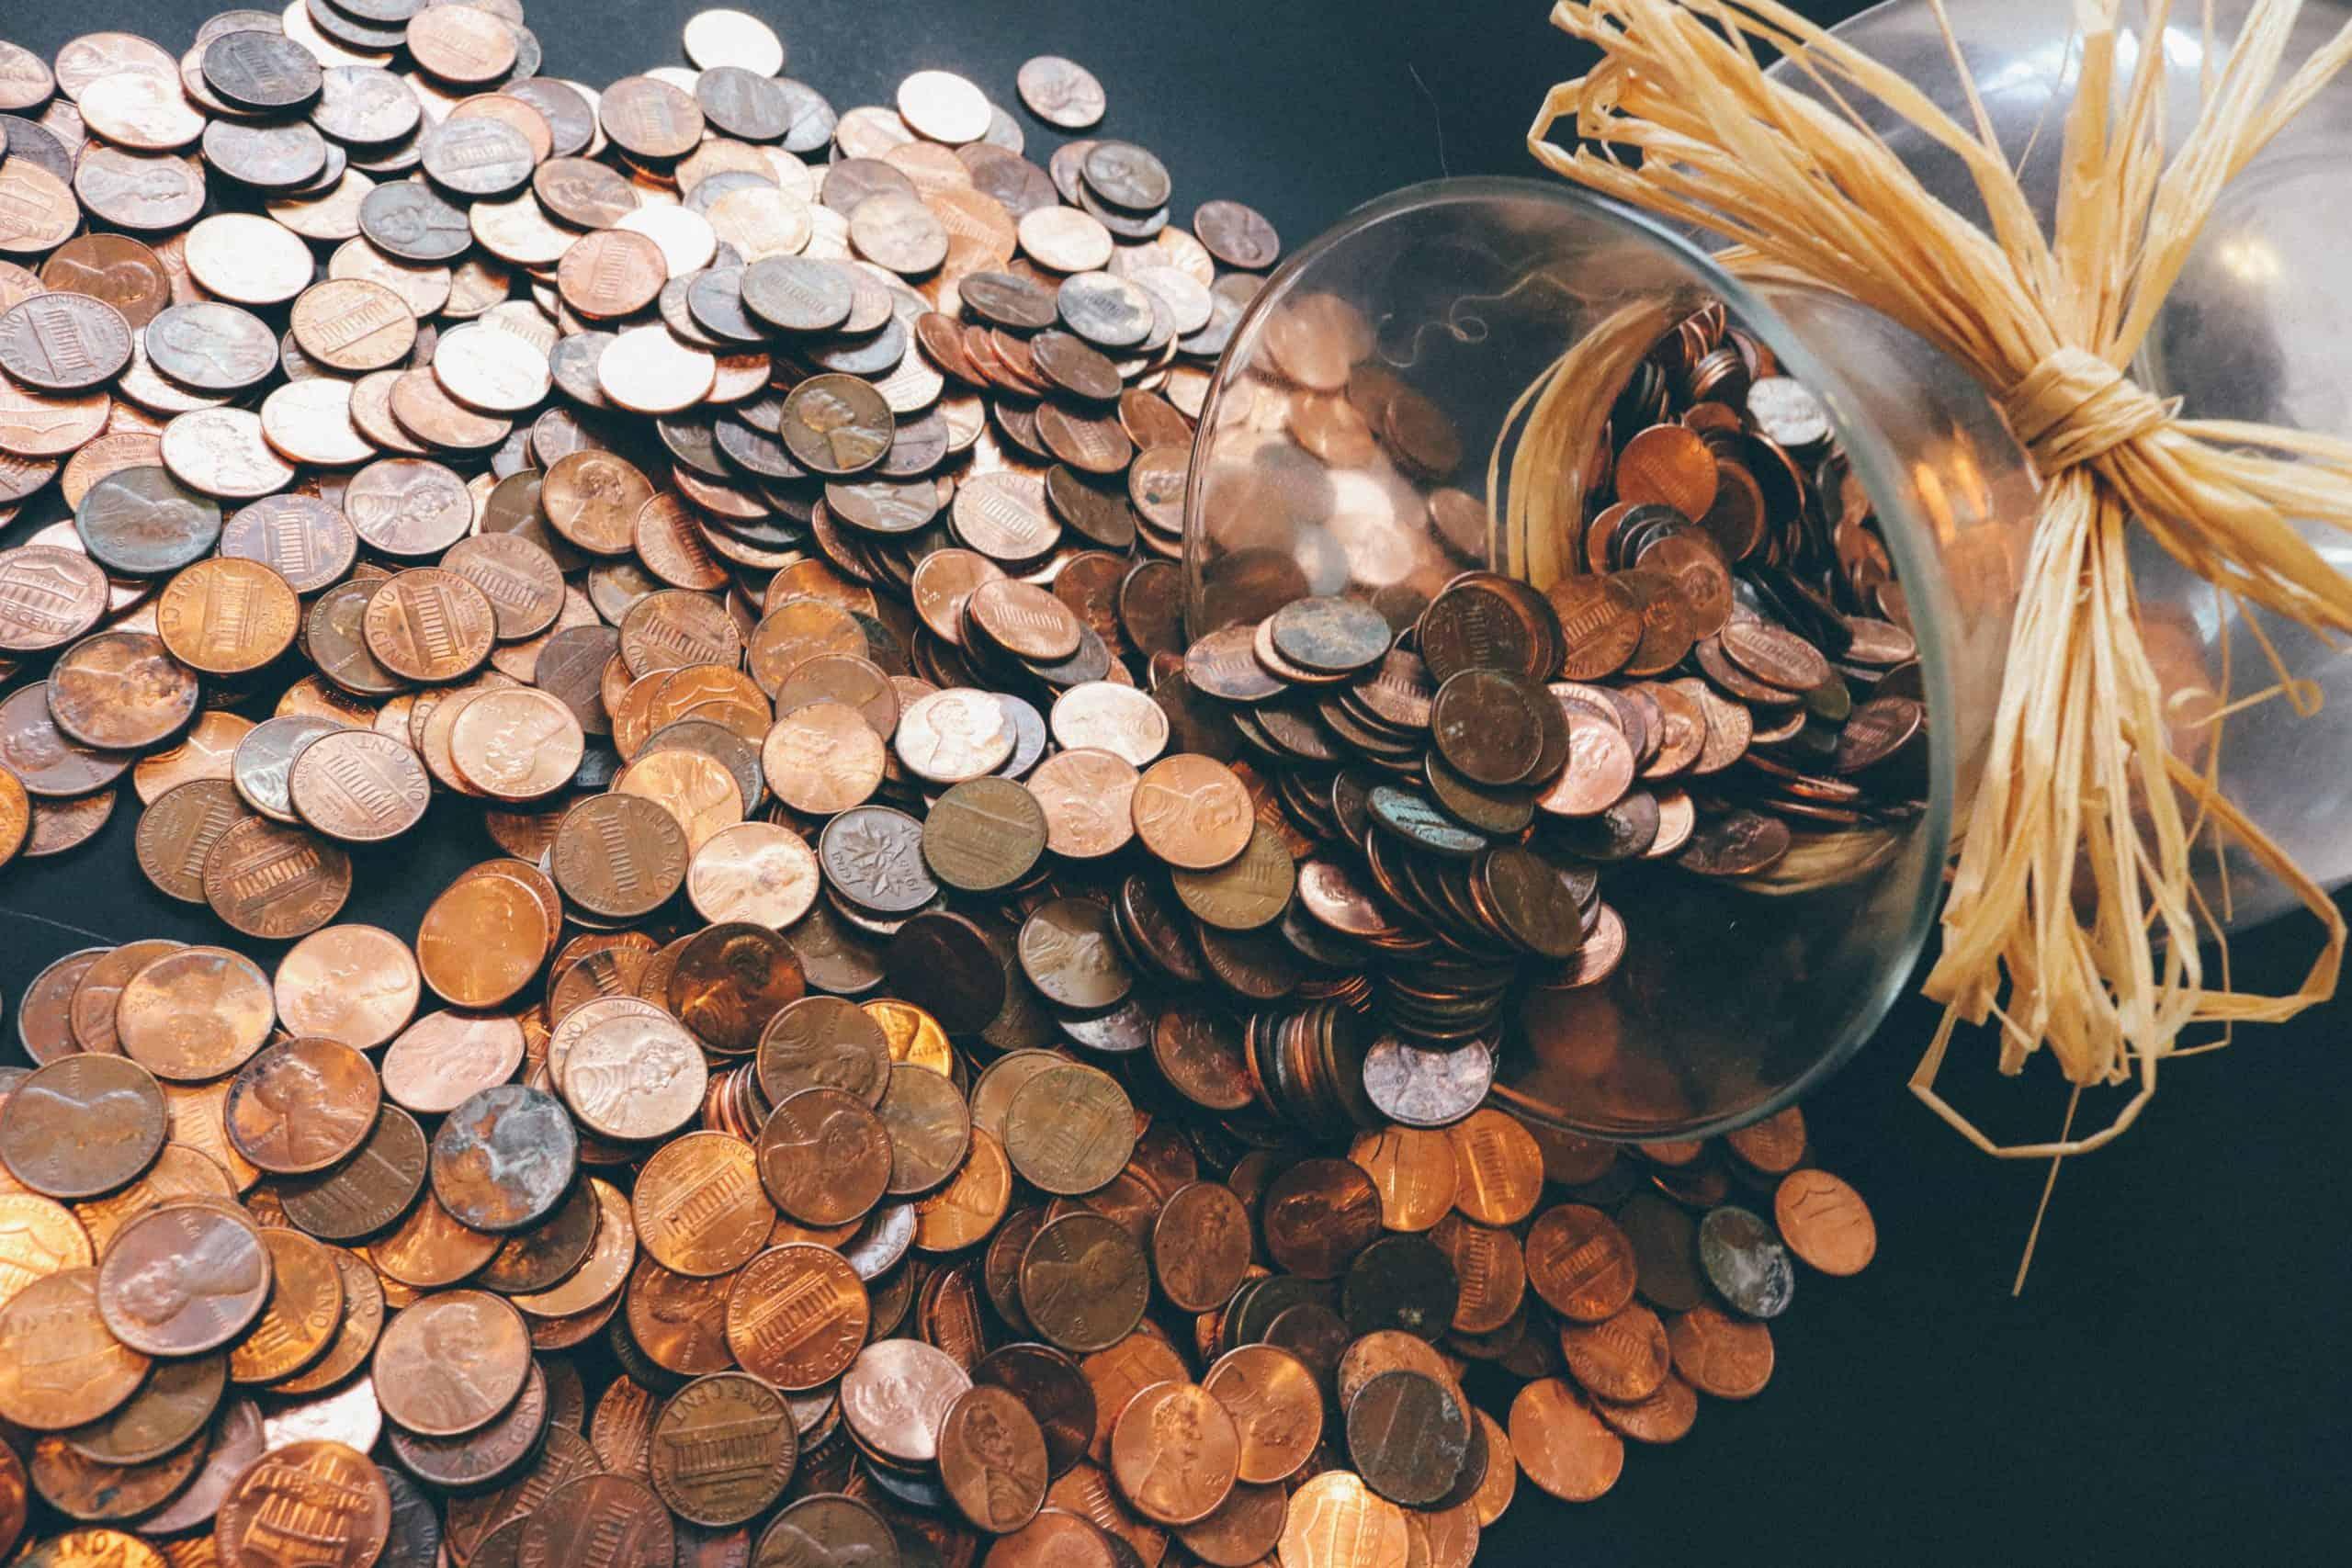 Cost savings through virtual conferences